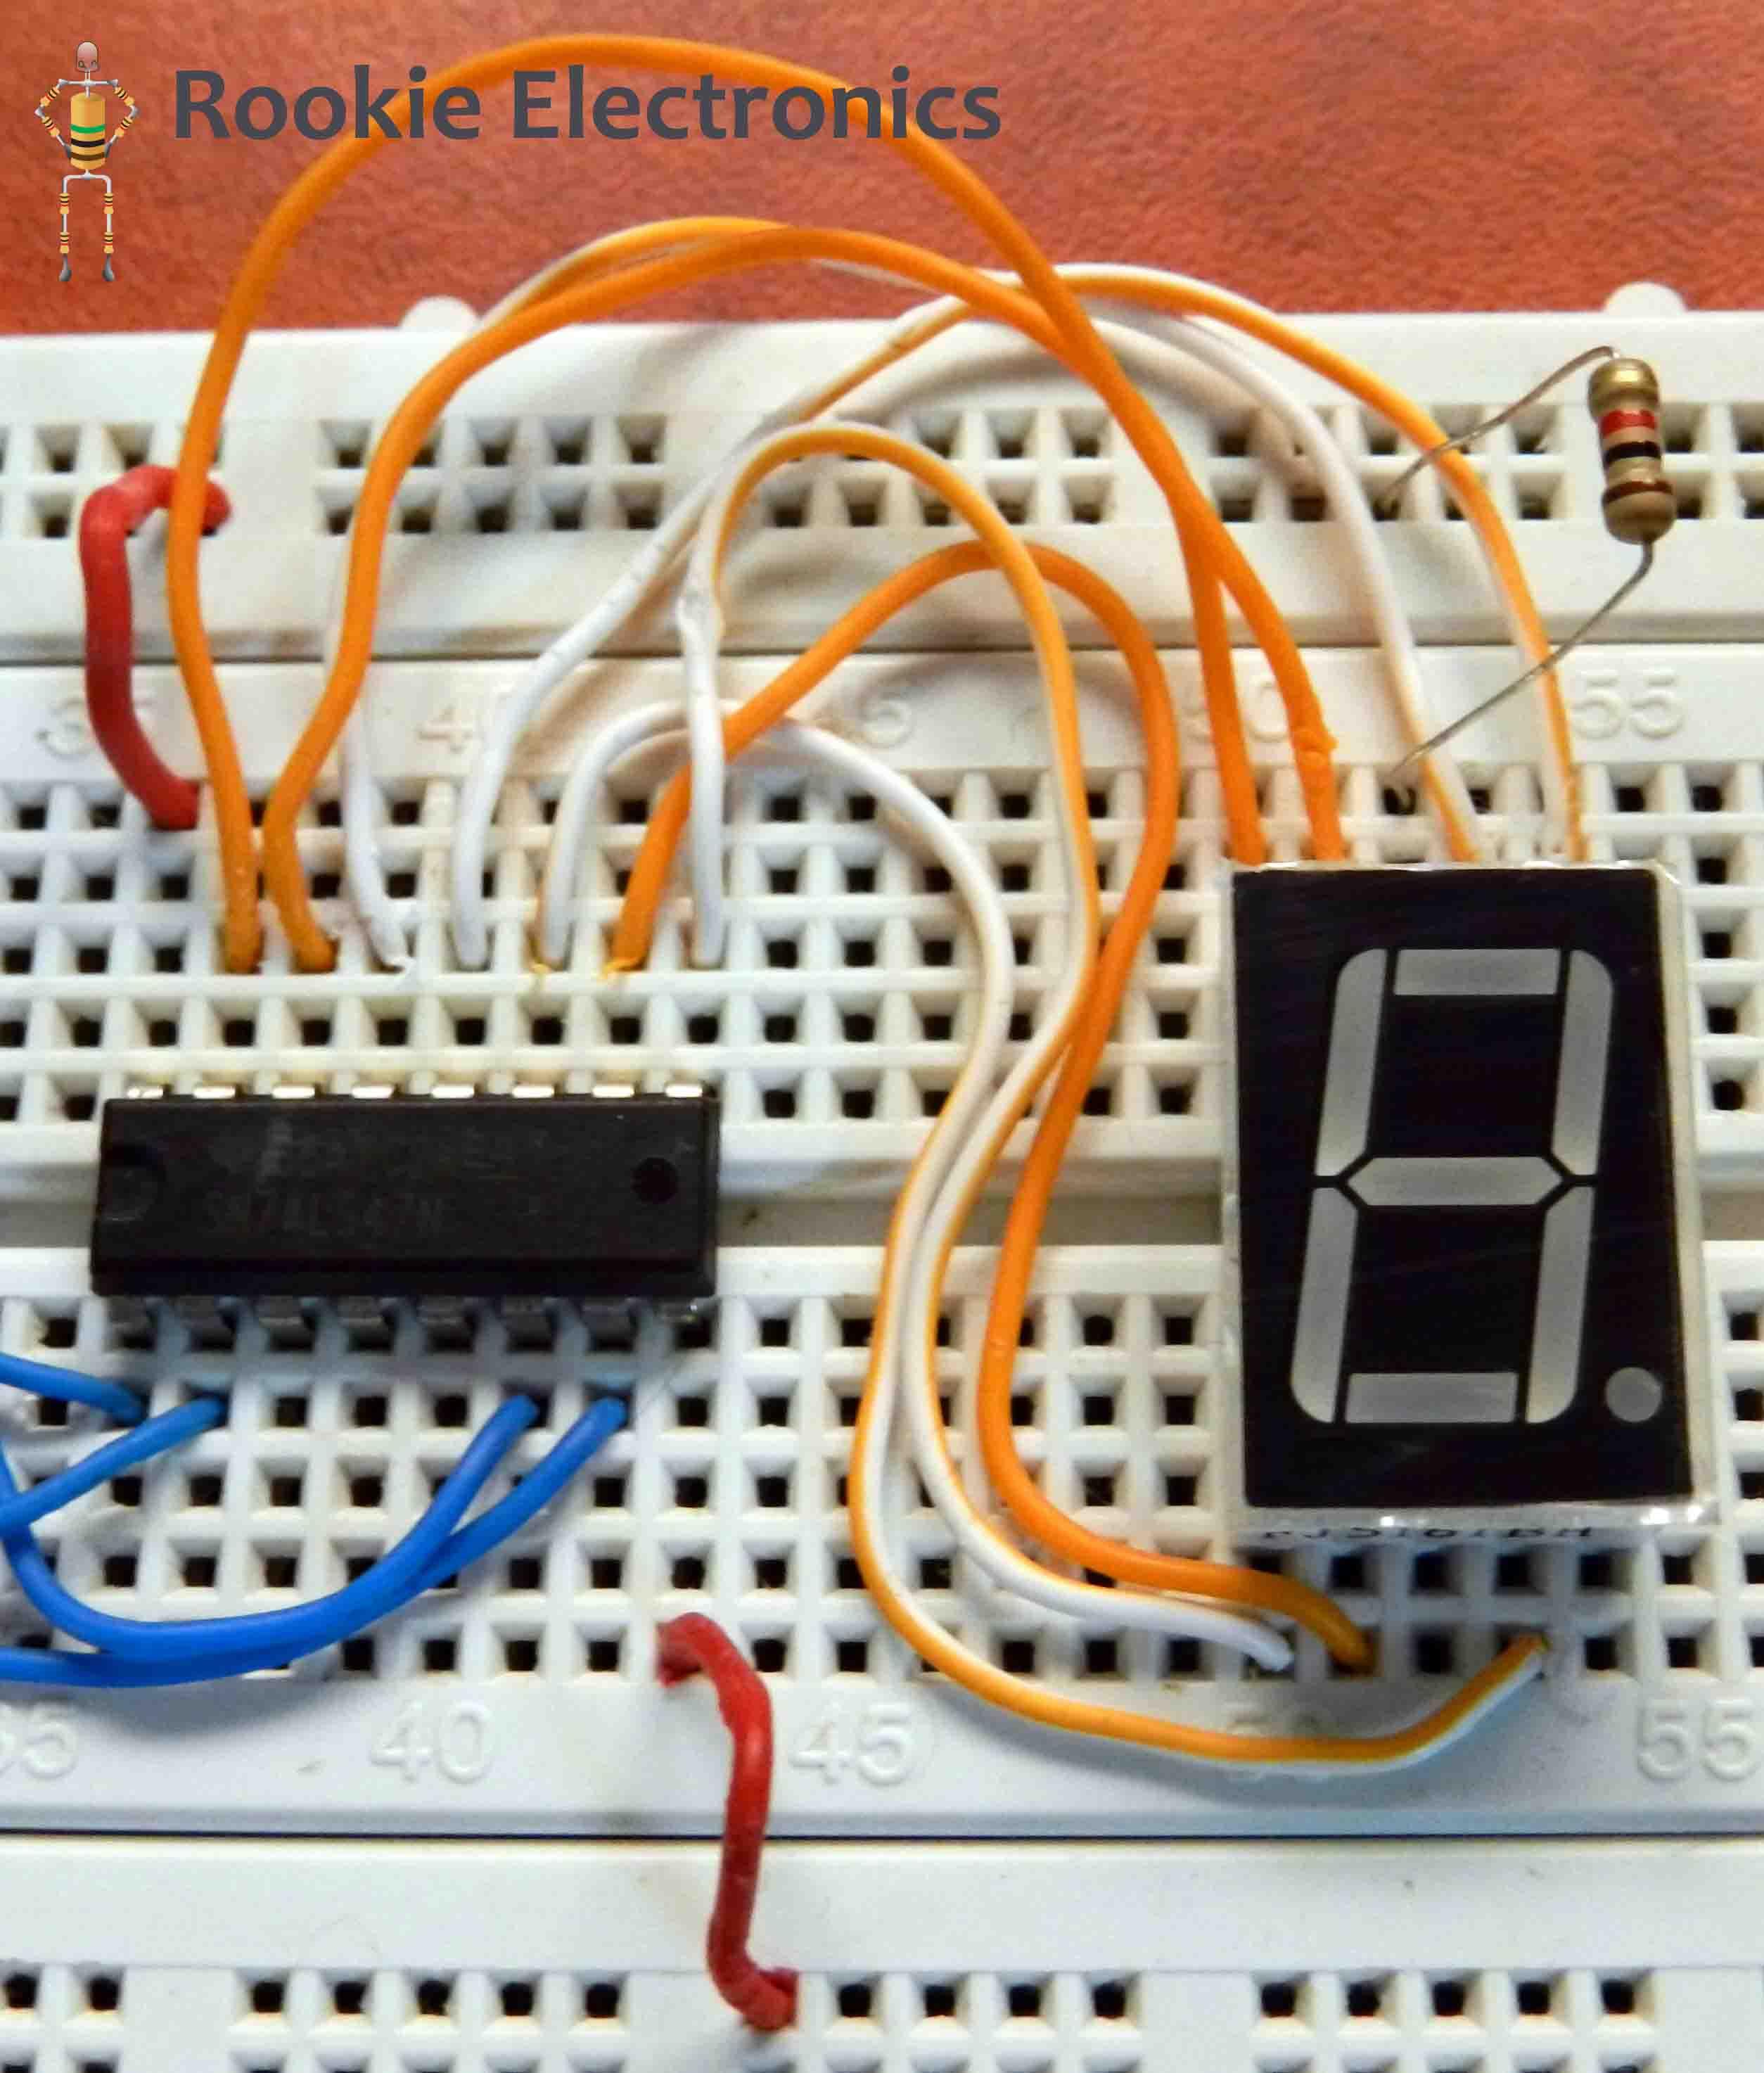 Zero 2 Nine Counter Electronics Lab 7segdriverinverterwiringdiagramjpg 7 Segment Display Common Anode 9v Battery With Clip Circuit Diagram Bread Board Arrangement Pin Confiiguration